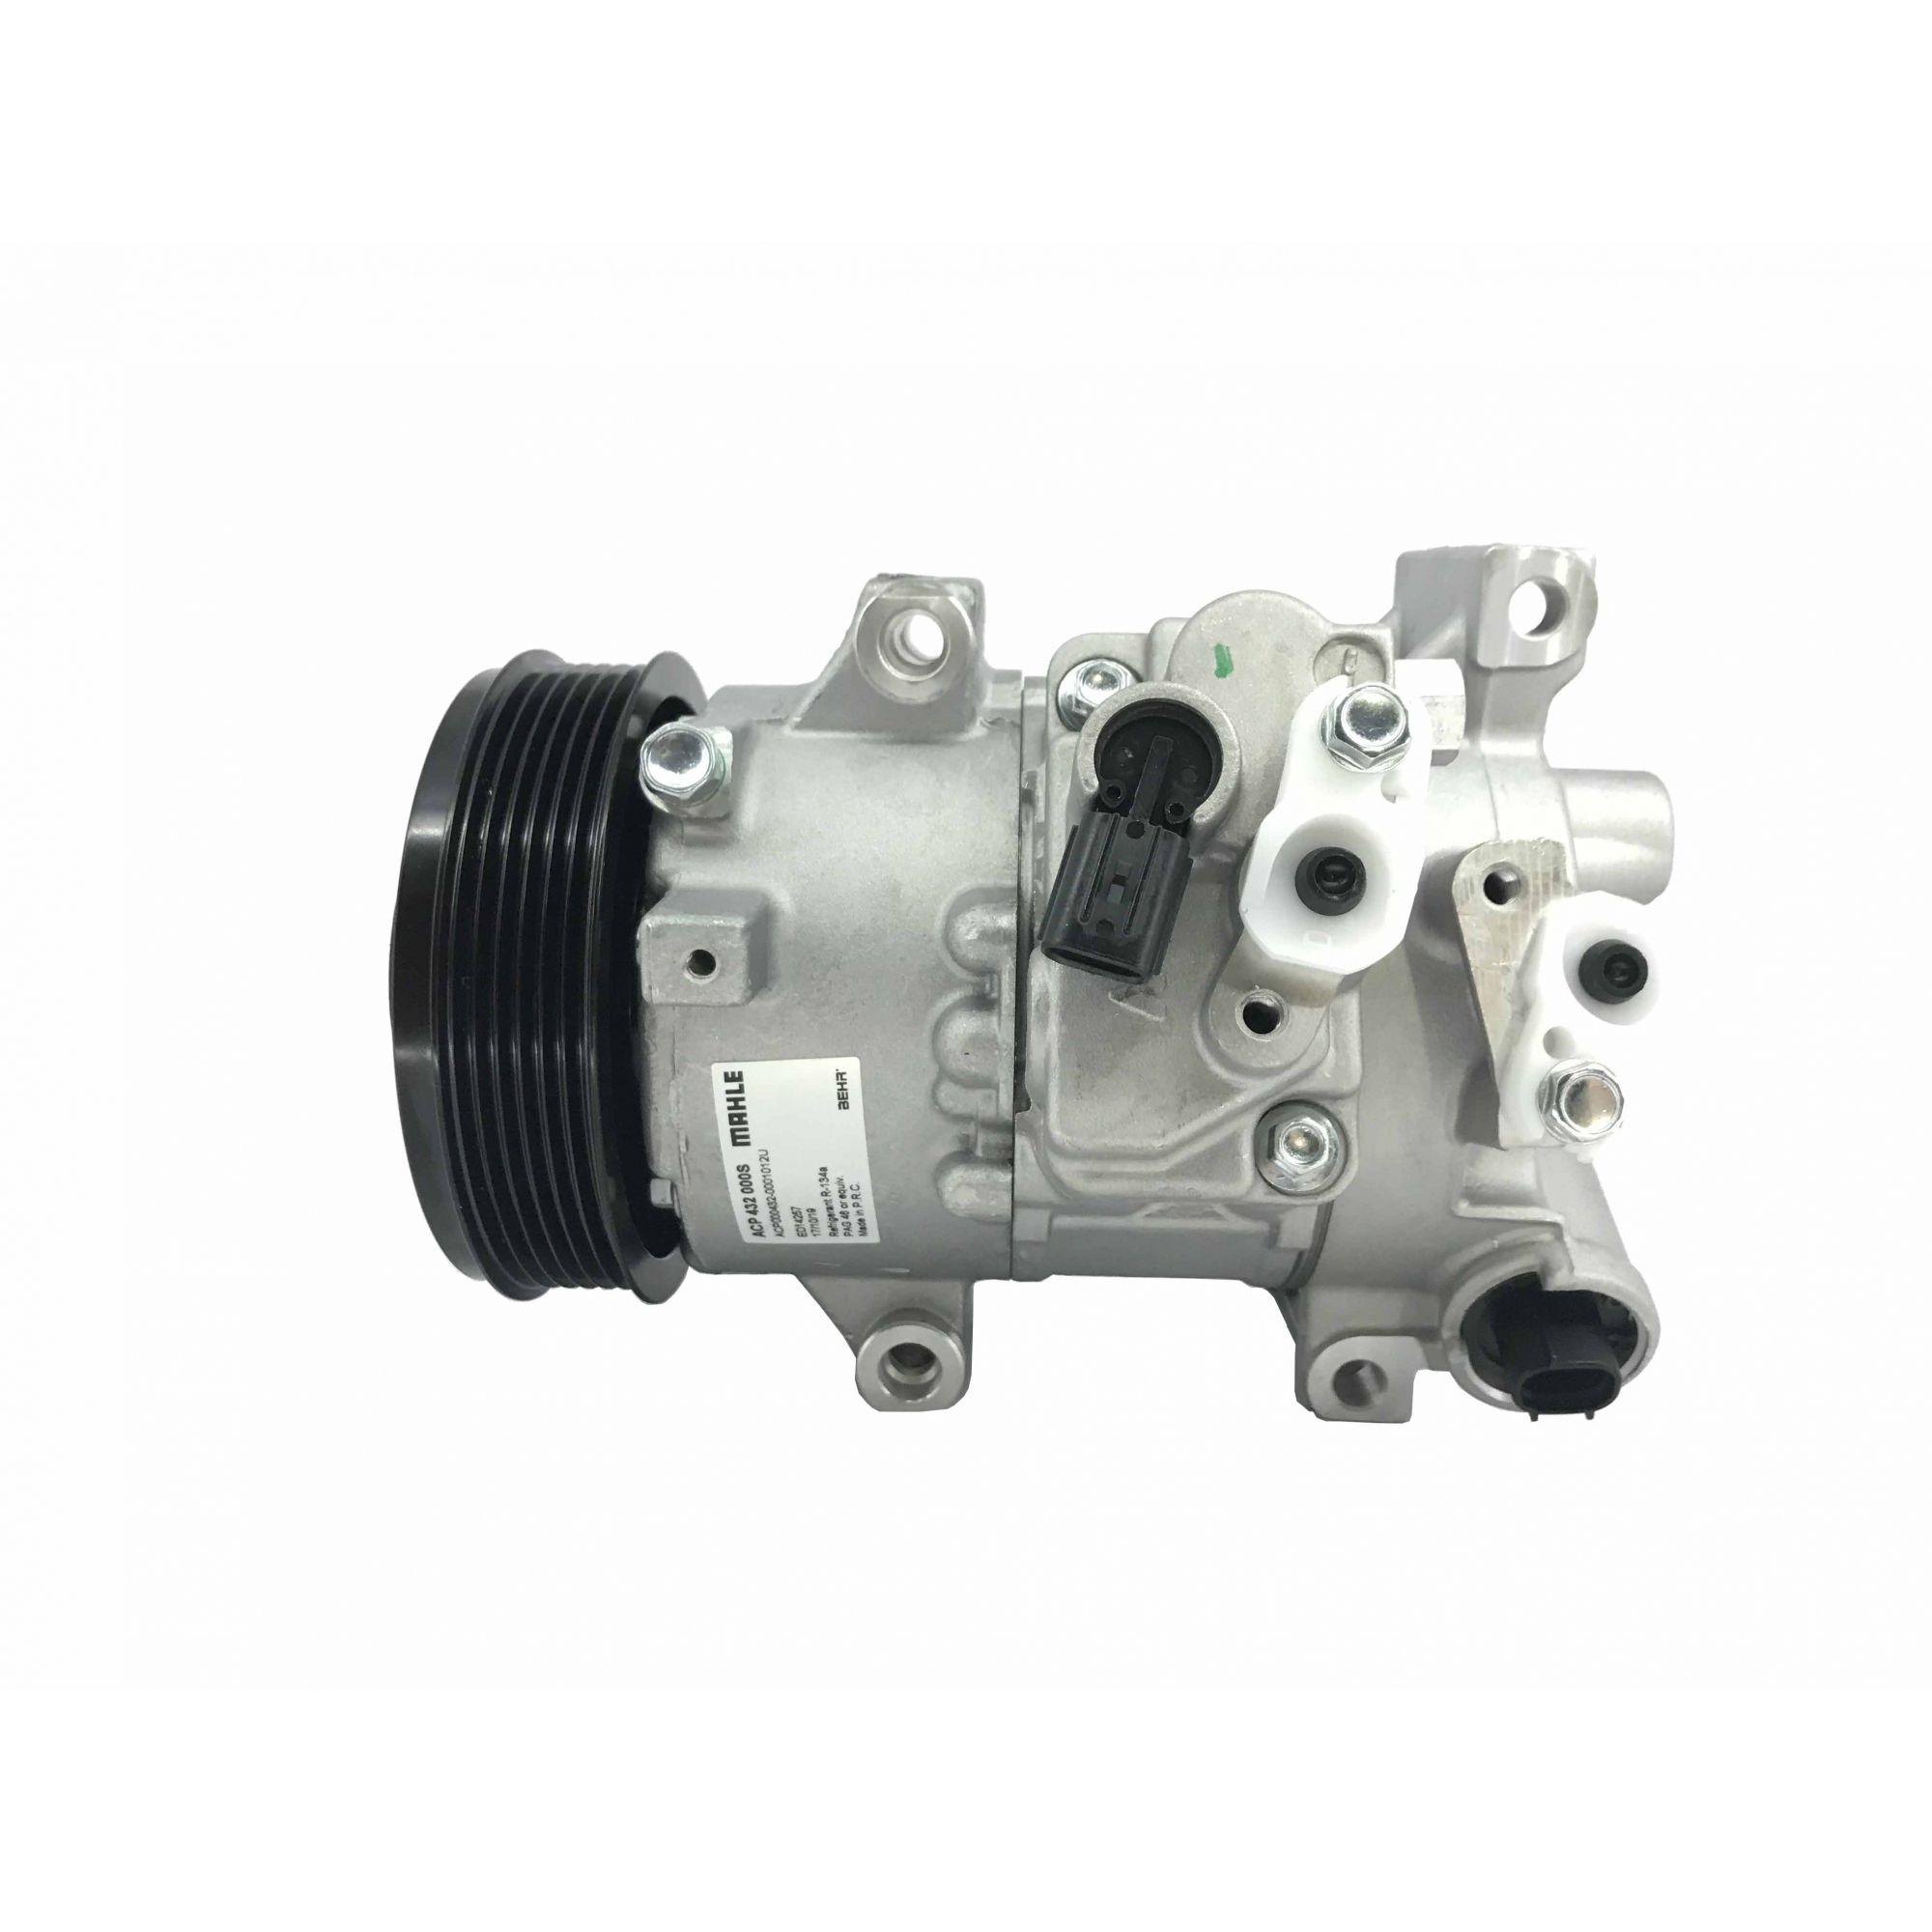 Compressor Toyota Corolla 1.8 2012 a 2015 - MAHLE Original